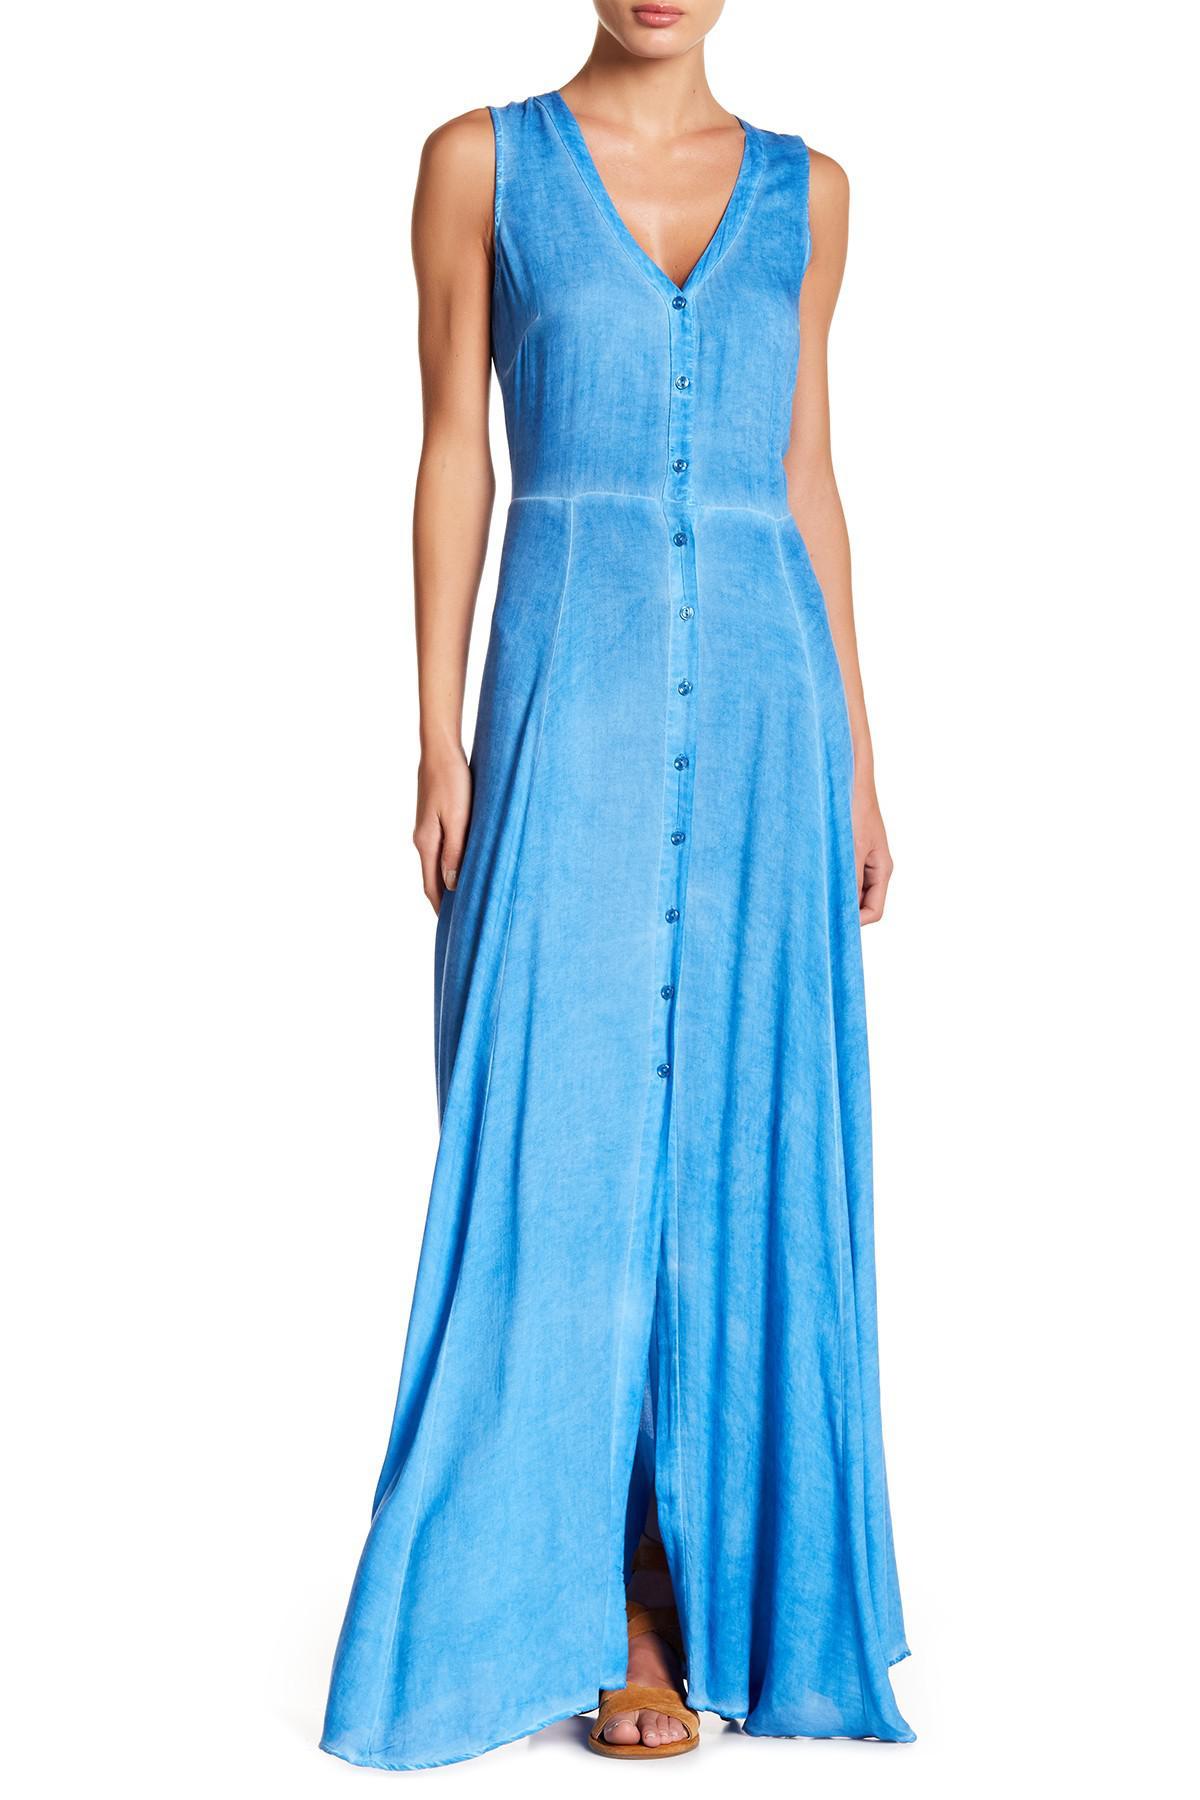 Lyst - On the road Havana Sleeveless Maxi Dress in Blue